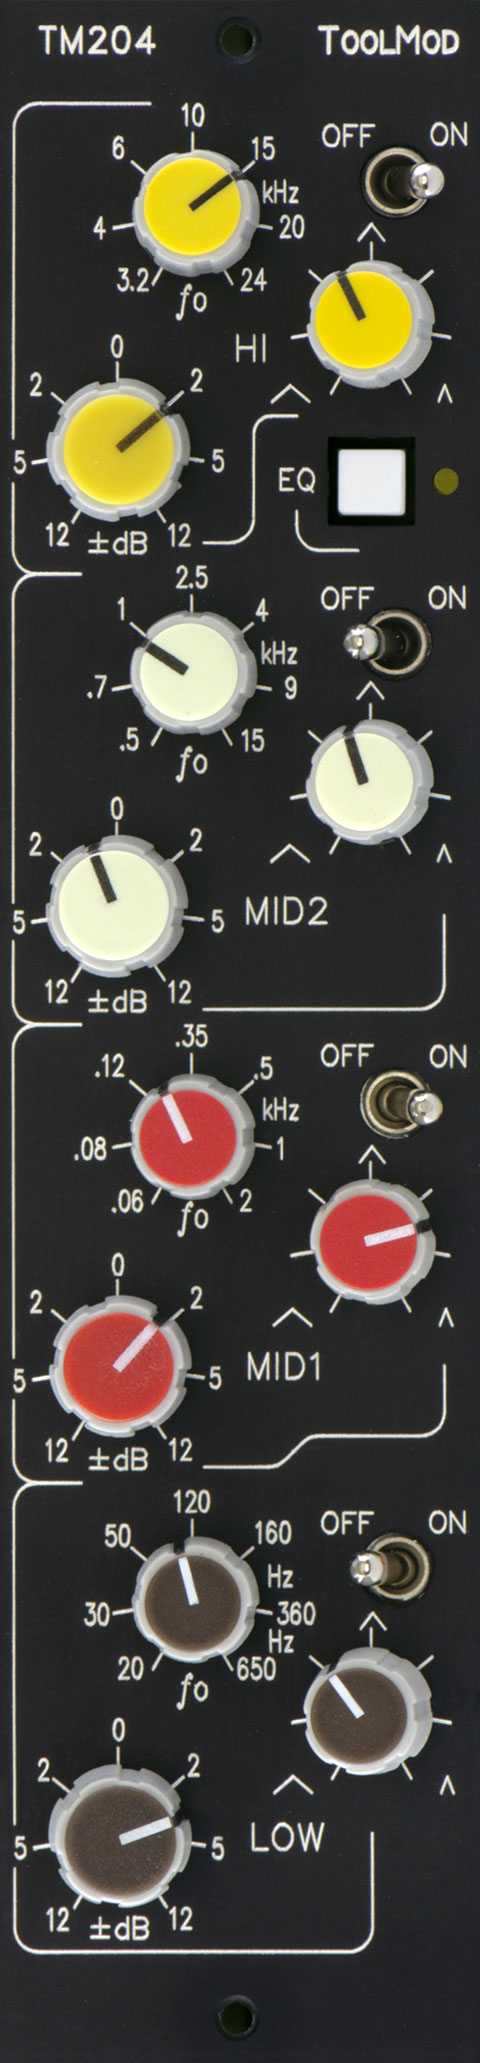 fully parametric 4-Band Stereo Mastering Equalizer TM204-12 v